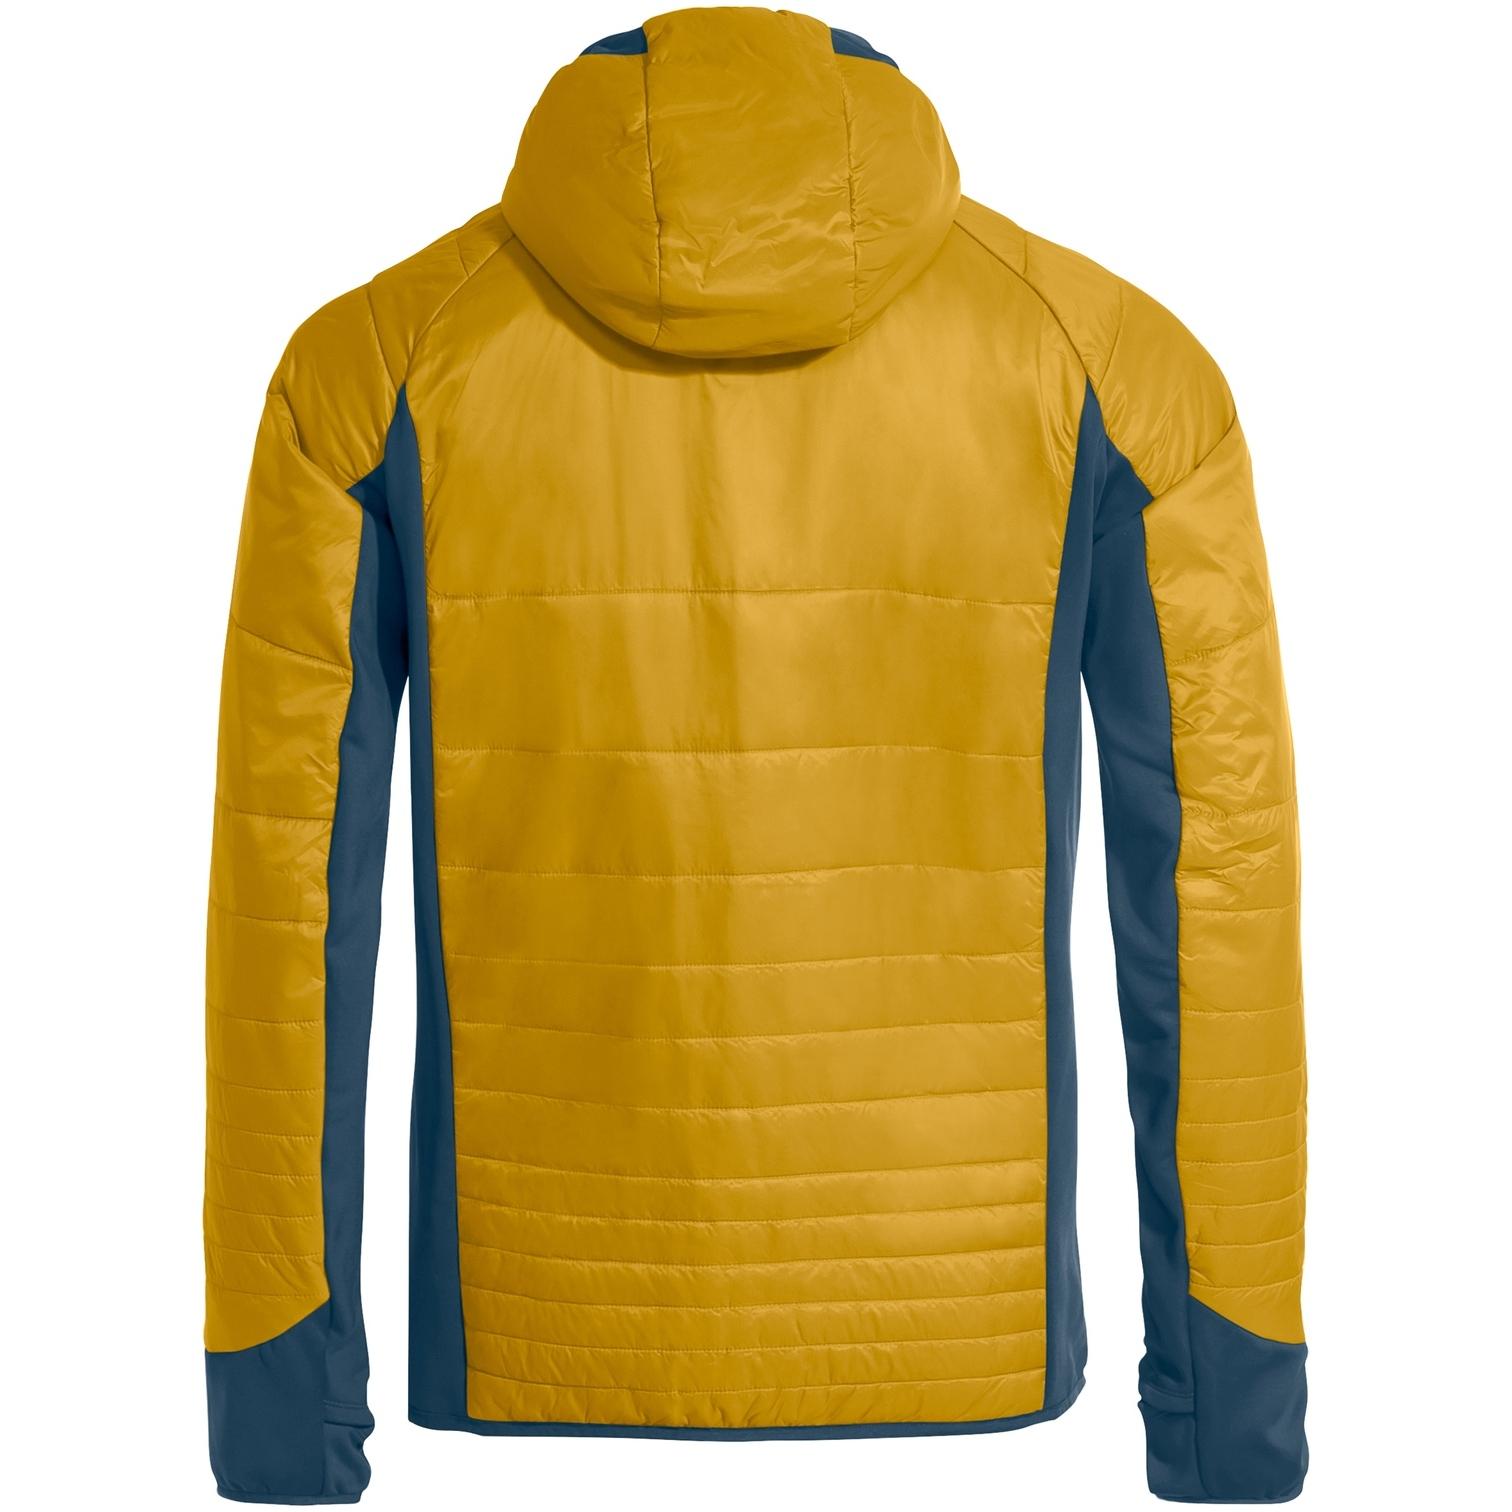 Image of Vaude Men's Sesvenna Jacket III - marigold